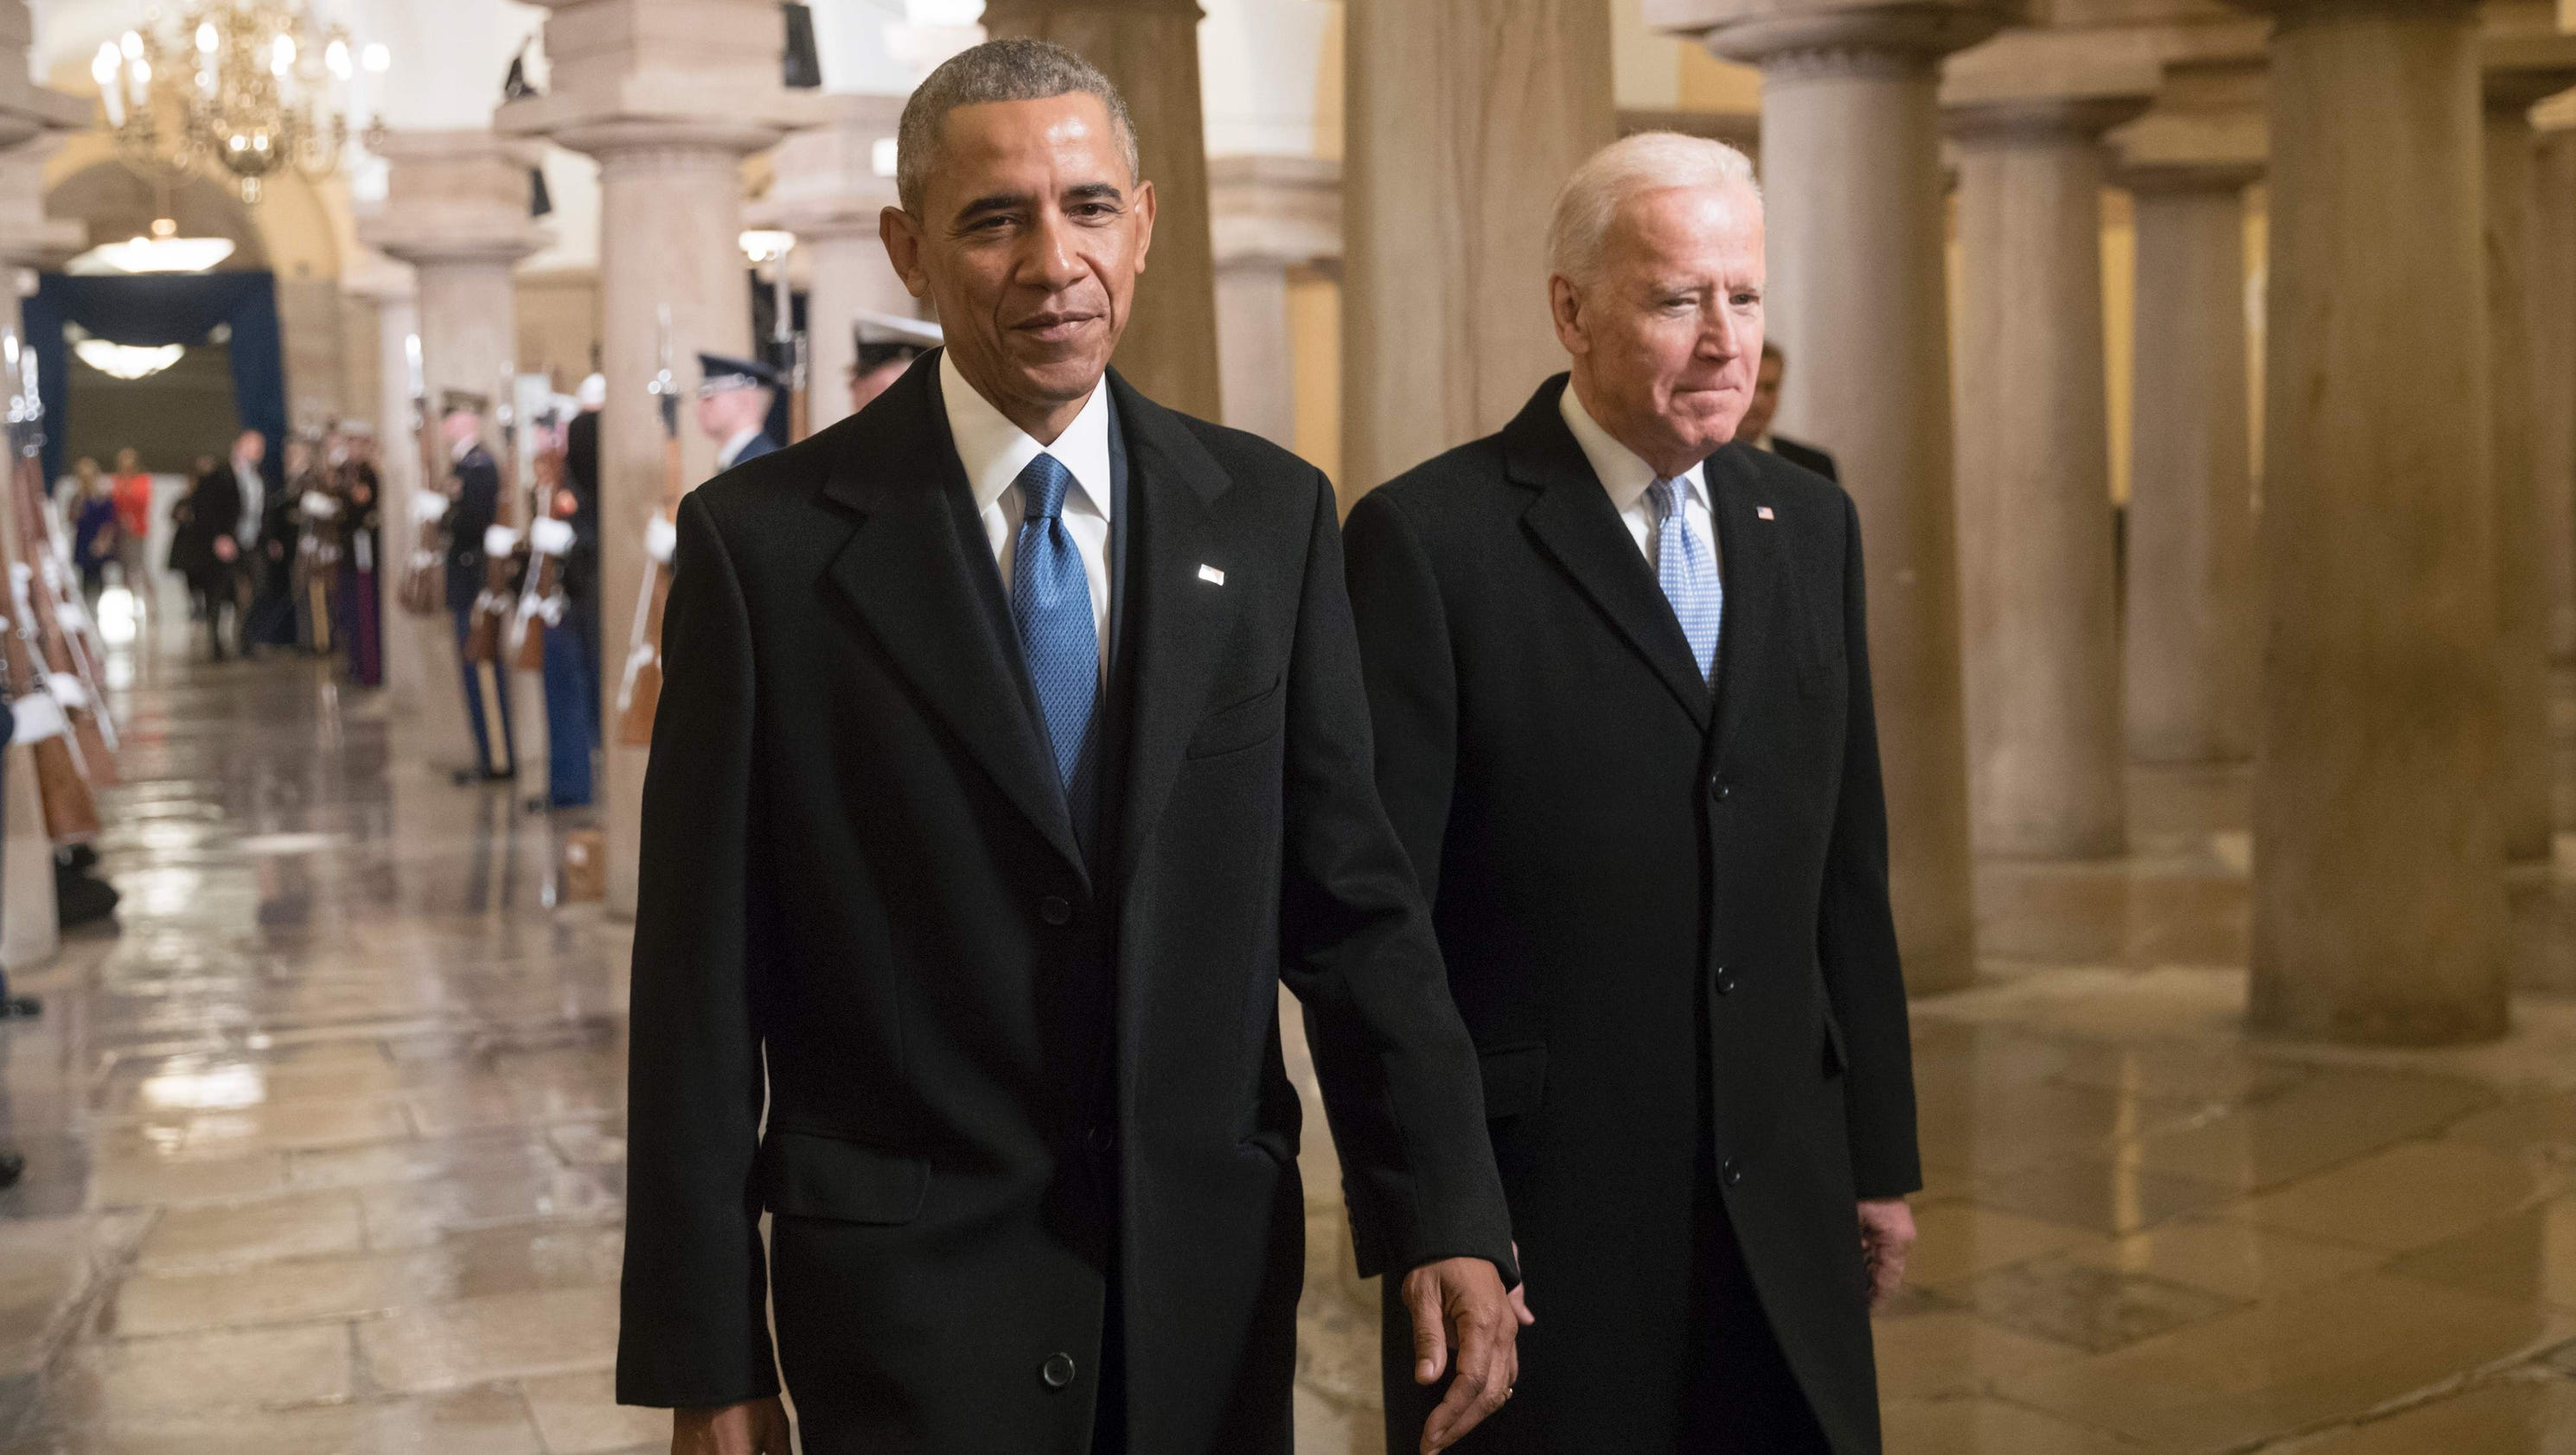 Obama, Biden seek action on gun violence after Texas shooting